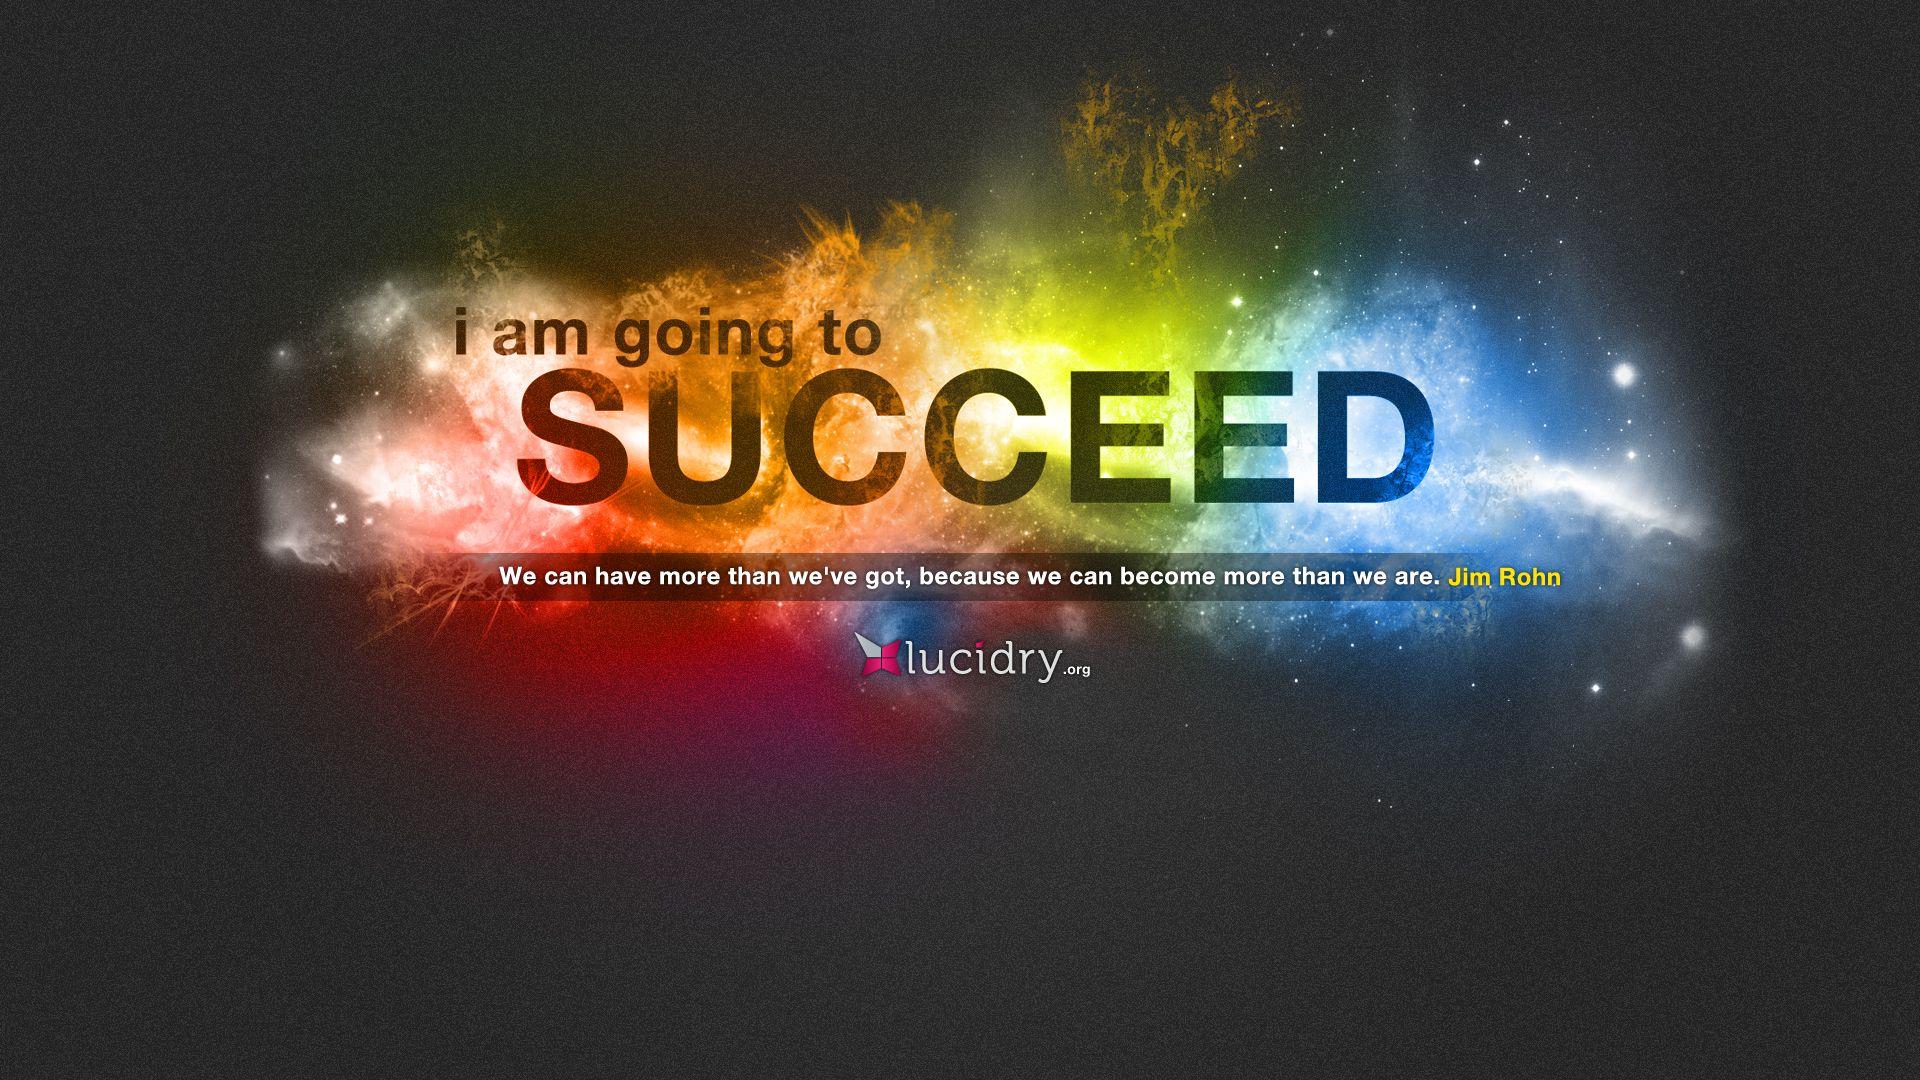 Success Quotes Hd Wallpapers 1080p Inspirational Wallpapers For Success Www Pixshark Com